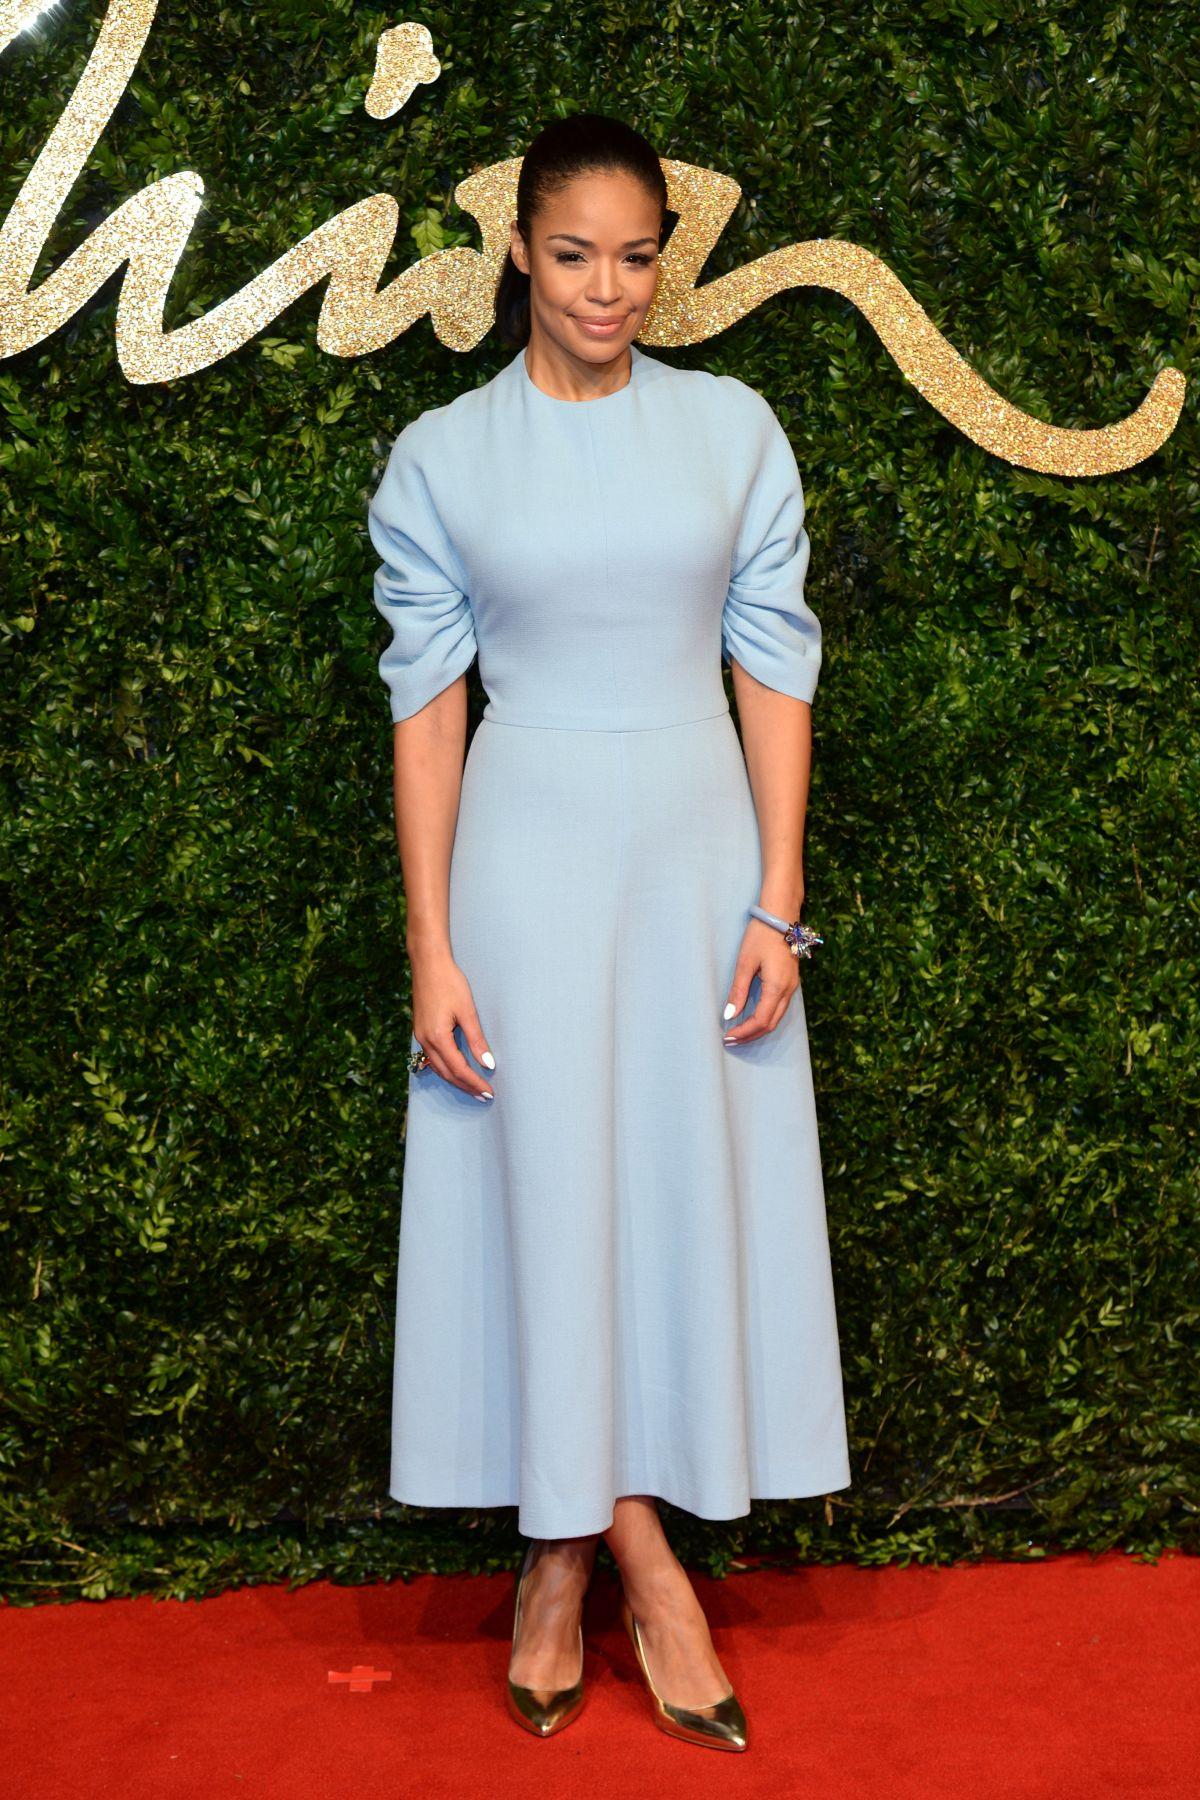 SARAH-JANE CRWFORD at 2015 British Fashion Awards in London 11/23/2015